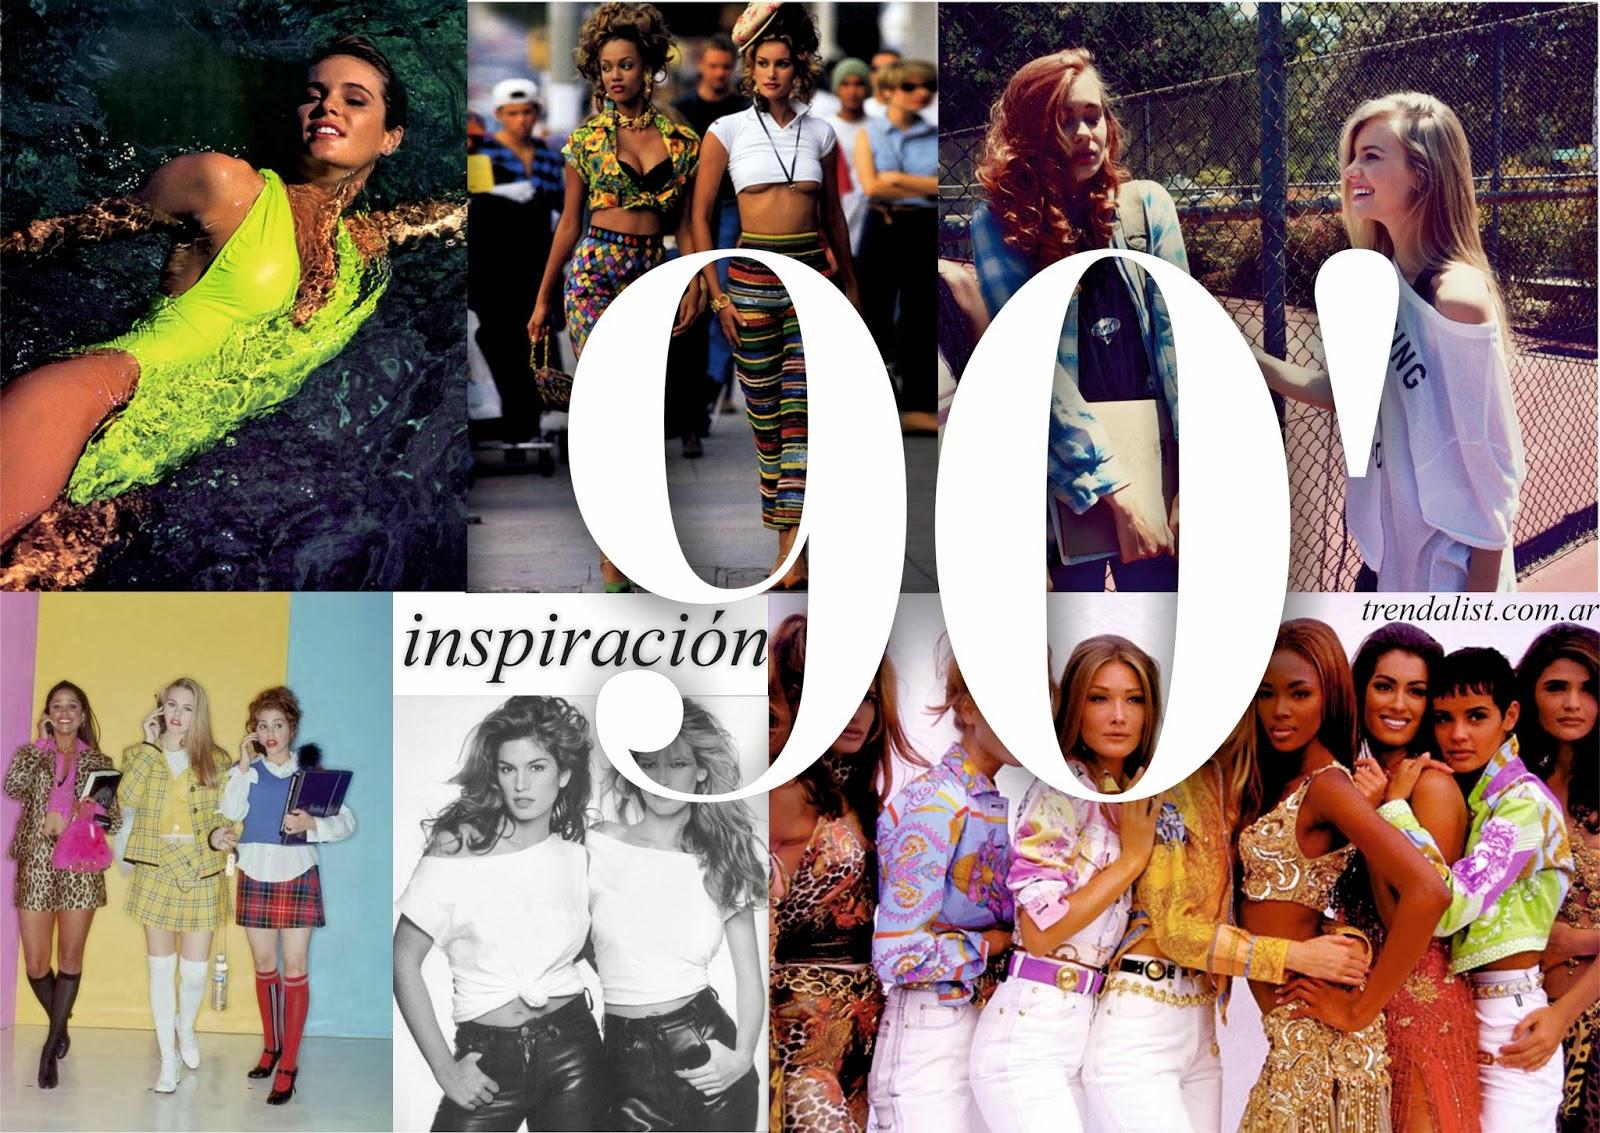 nineties inspiration